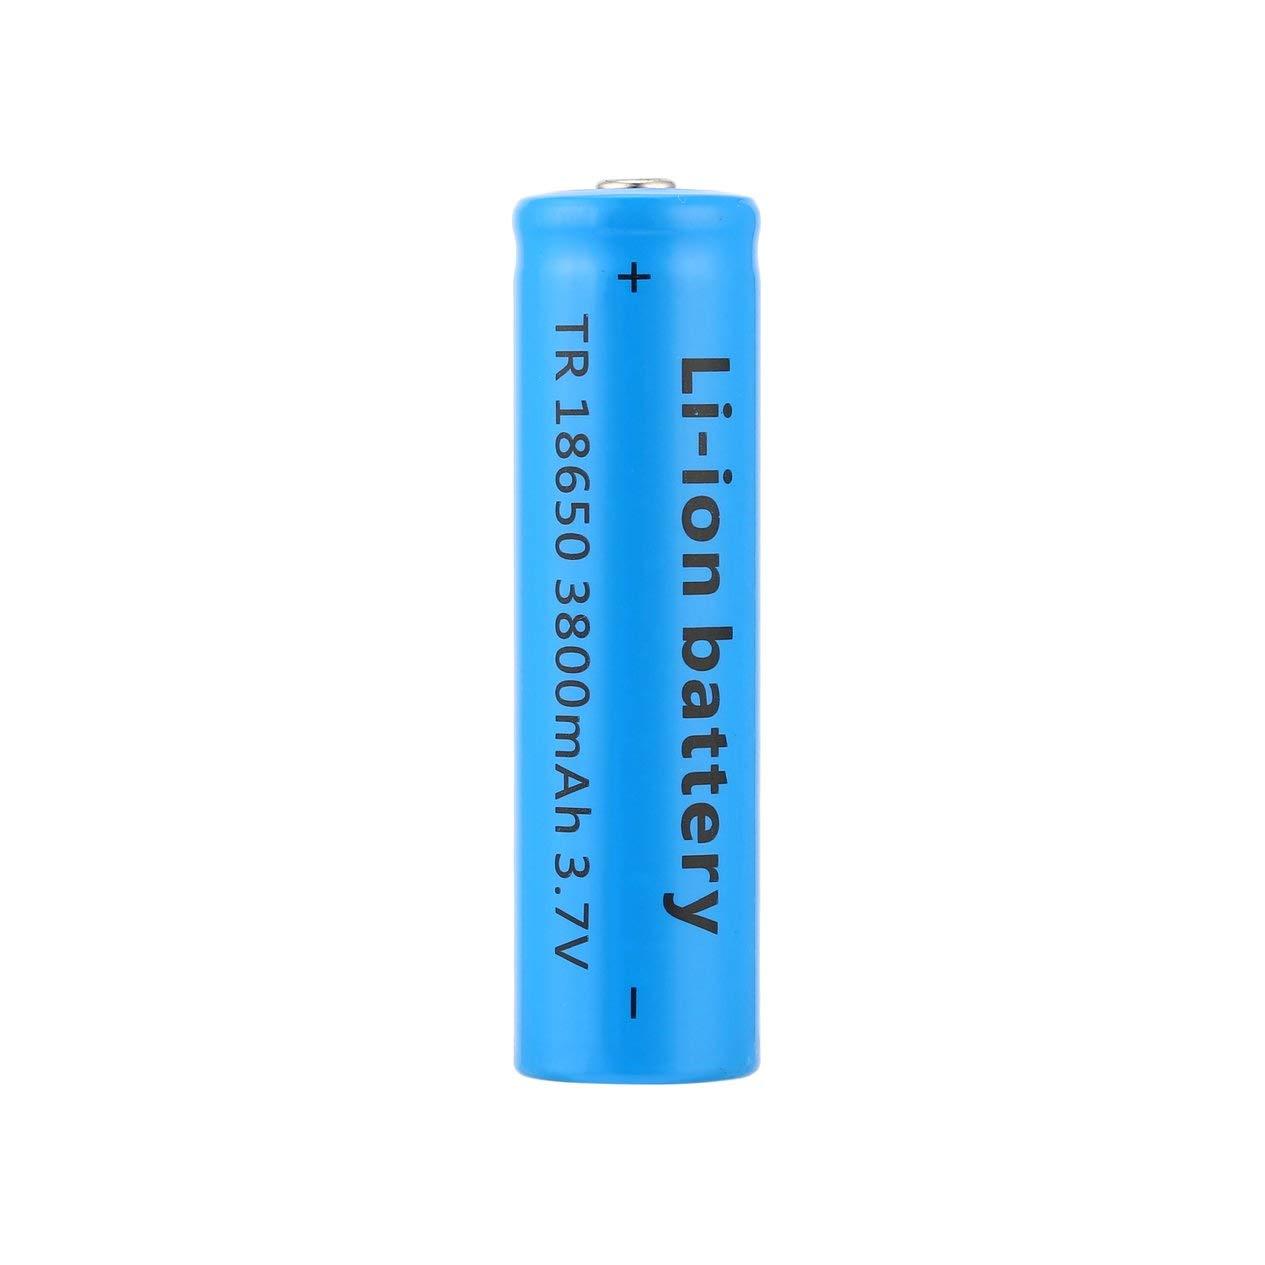 3800mAh 3.7V Li-Ion Akku, 18650 Li-Ion 3800mAh große Kapazität 3.7V Akku für LED-Taschenlampe blau neue Taschenlampe Batterien Ironheel